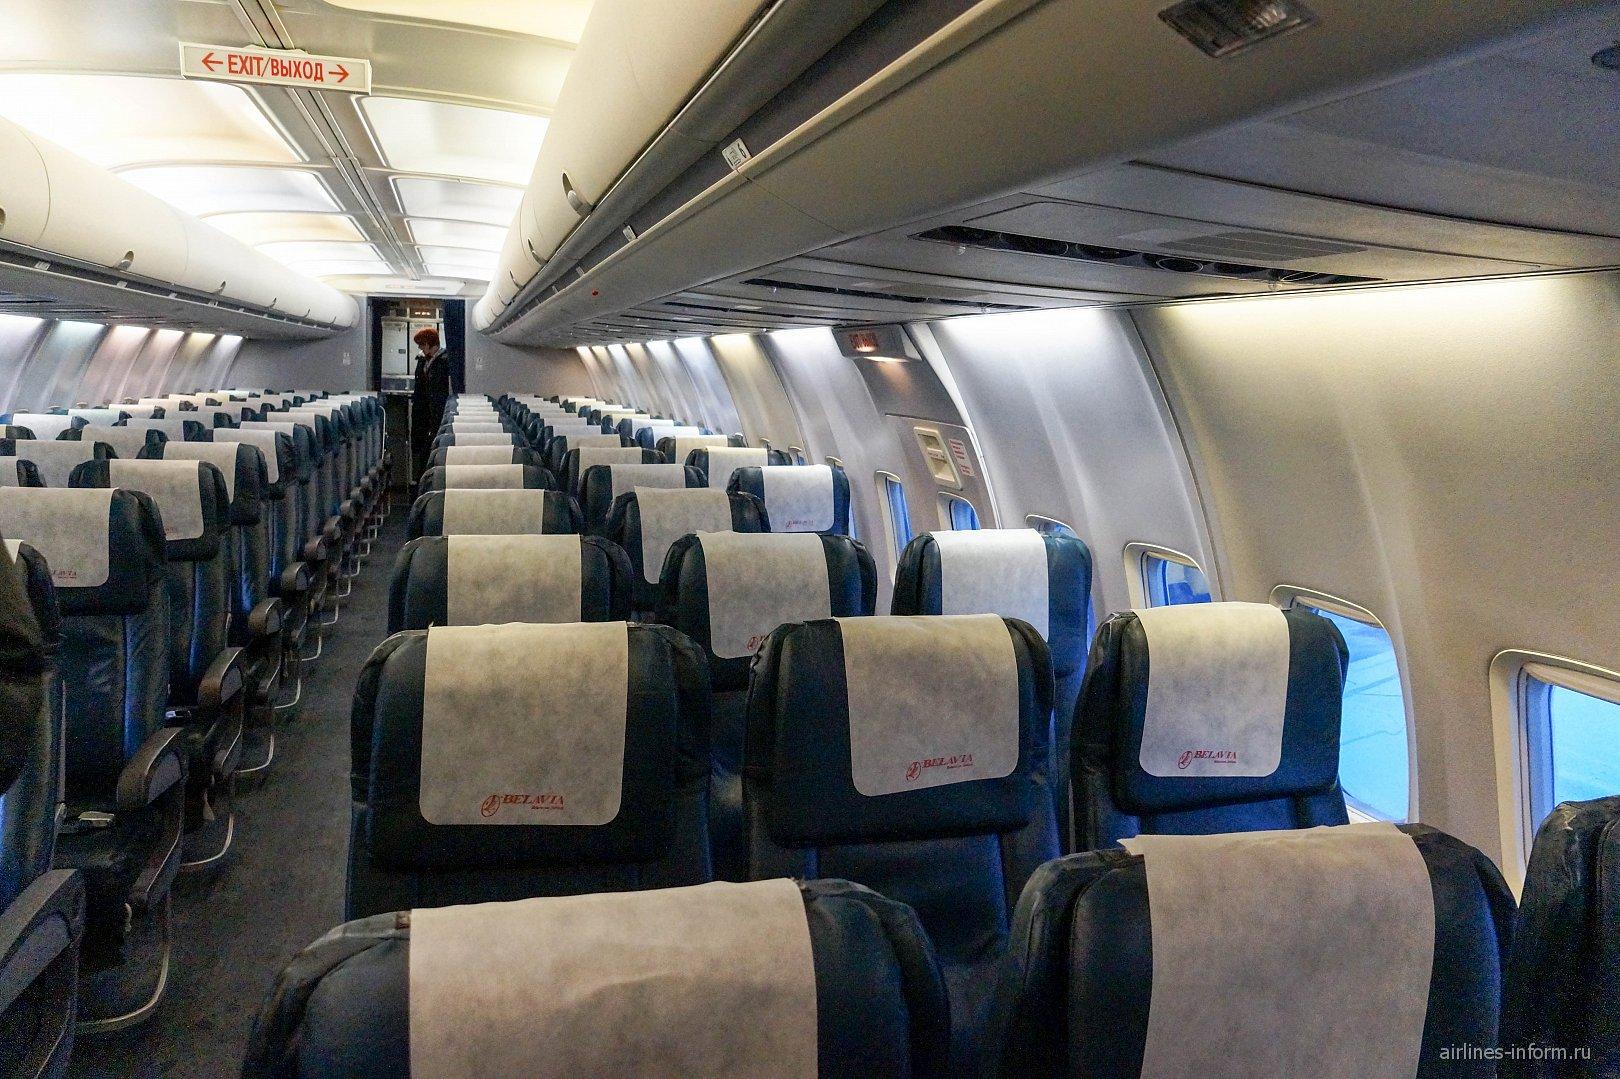 Пассажирский салон в самолете Боинг-737-500 авиакомпании